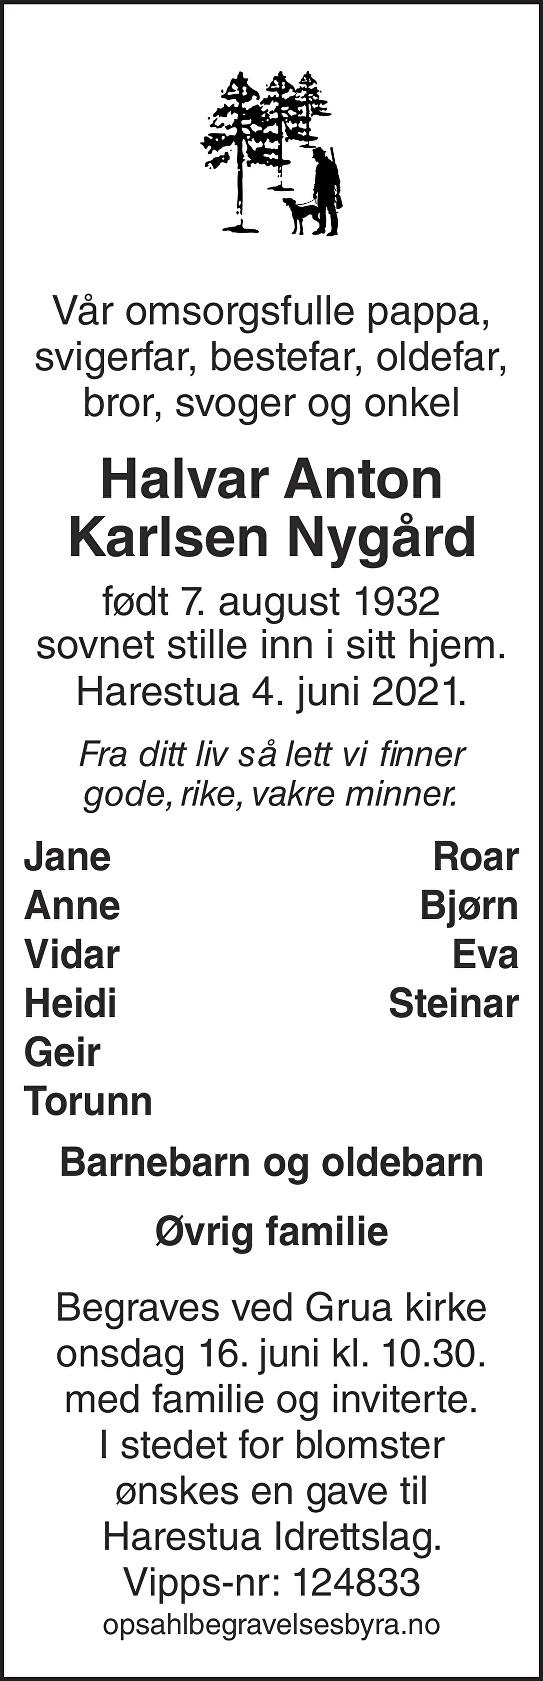 Halvar Anton Karlsen Nygård Dødsannonse